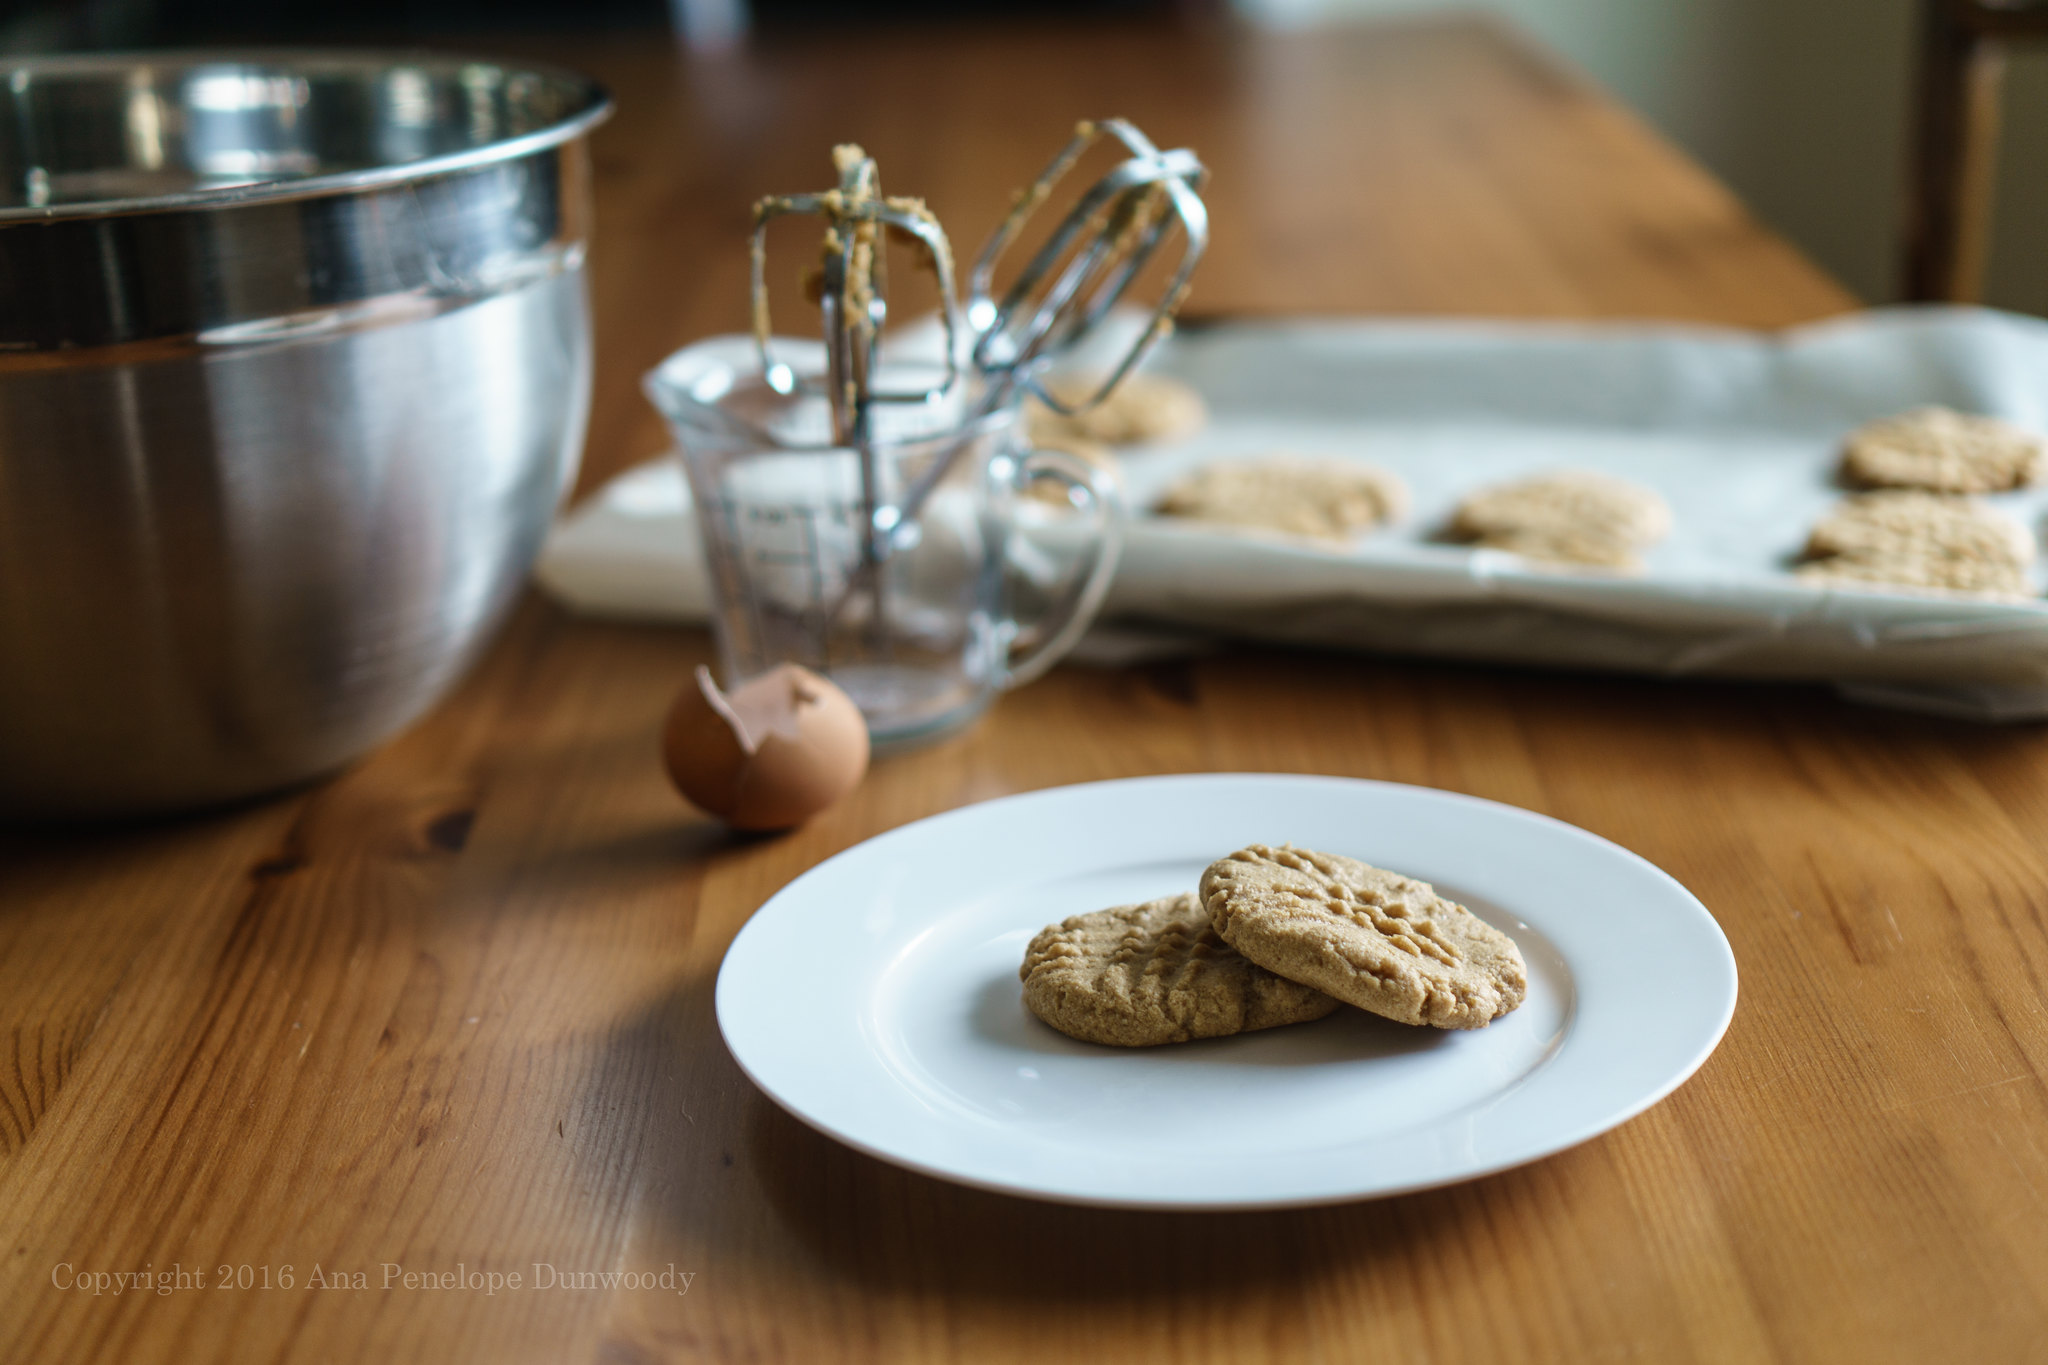 51/365 Peanut Butter Cookies (gluten free)